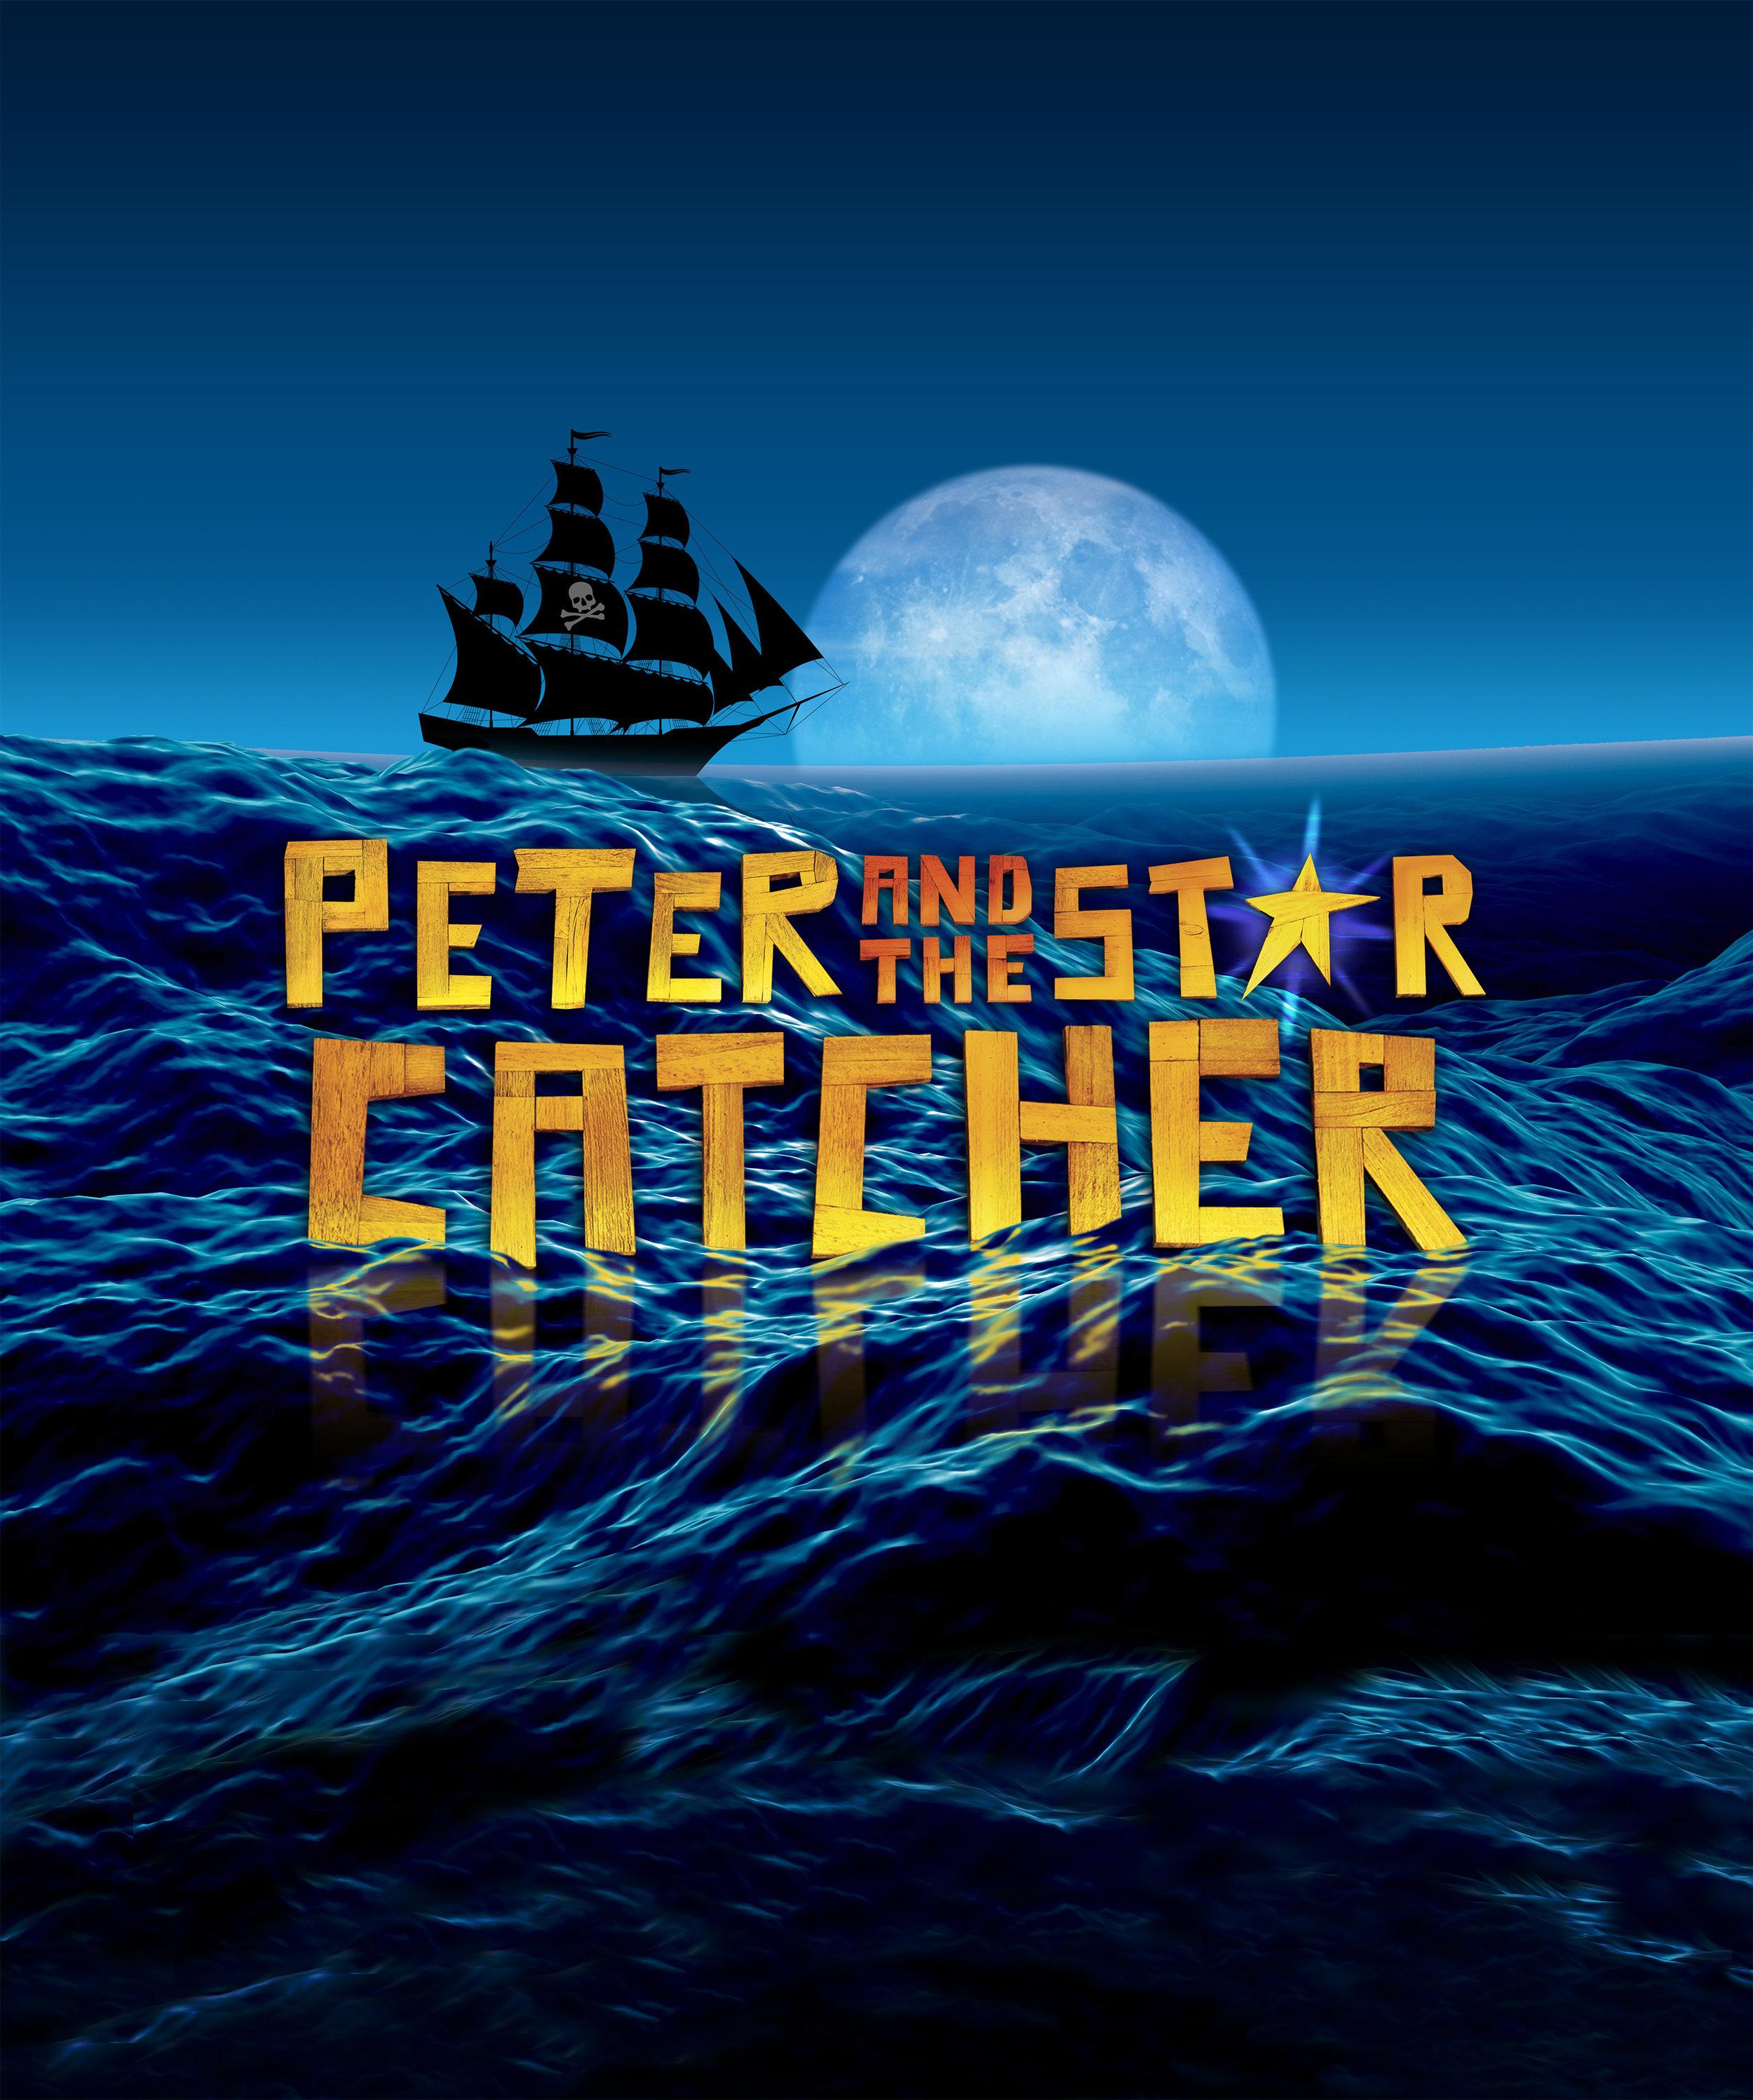 peter-and-the-starcatcher-ship-logo (1).jpg